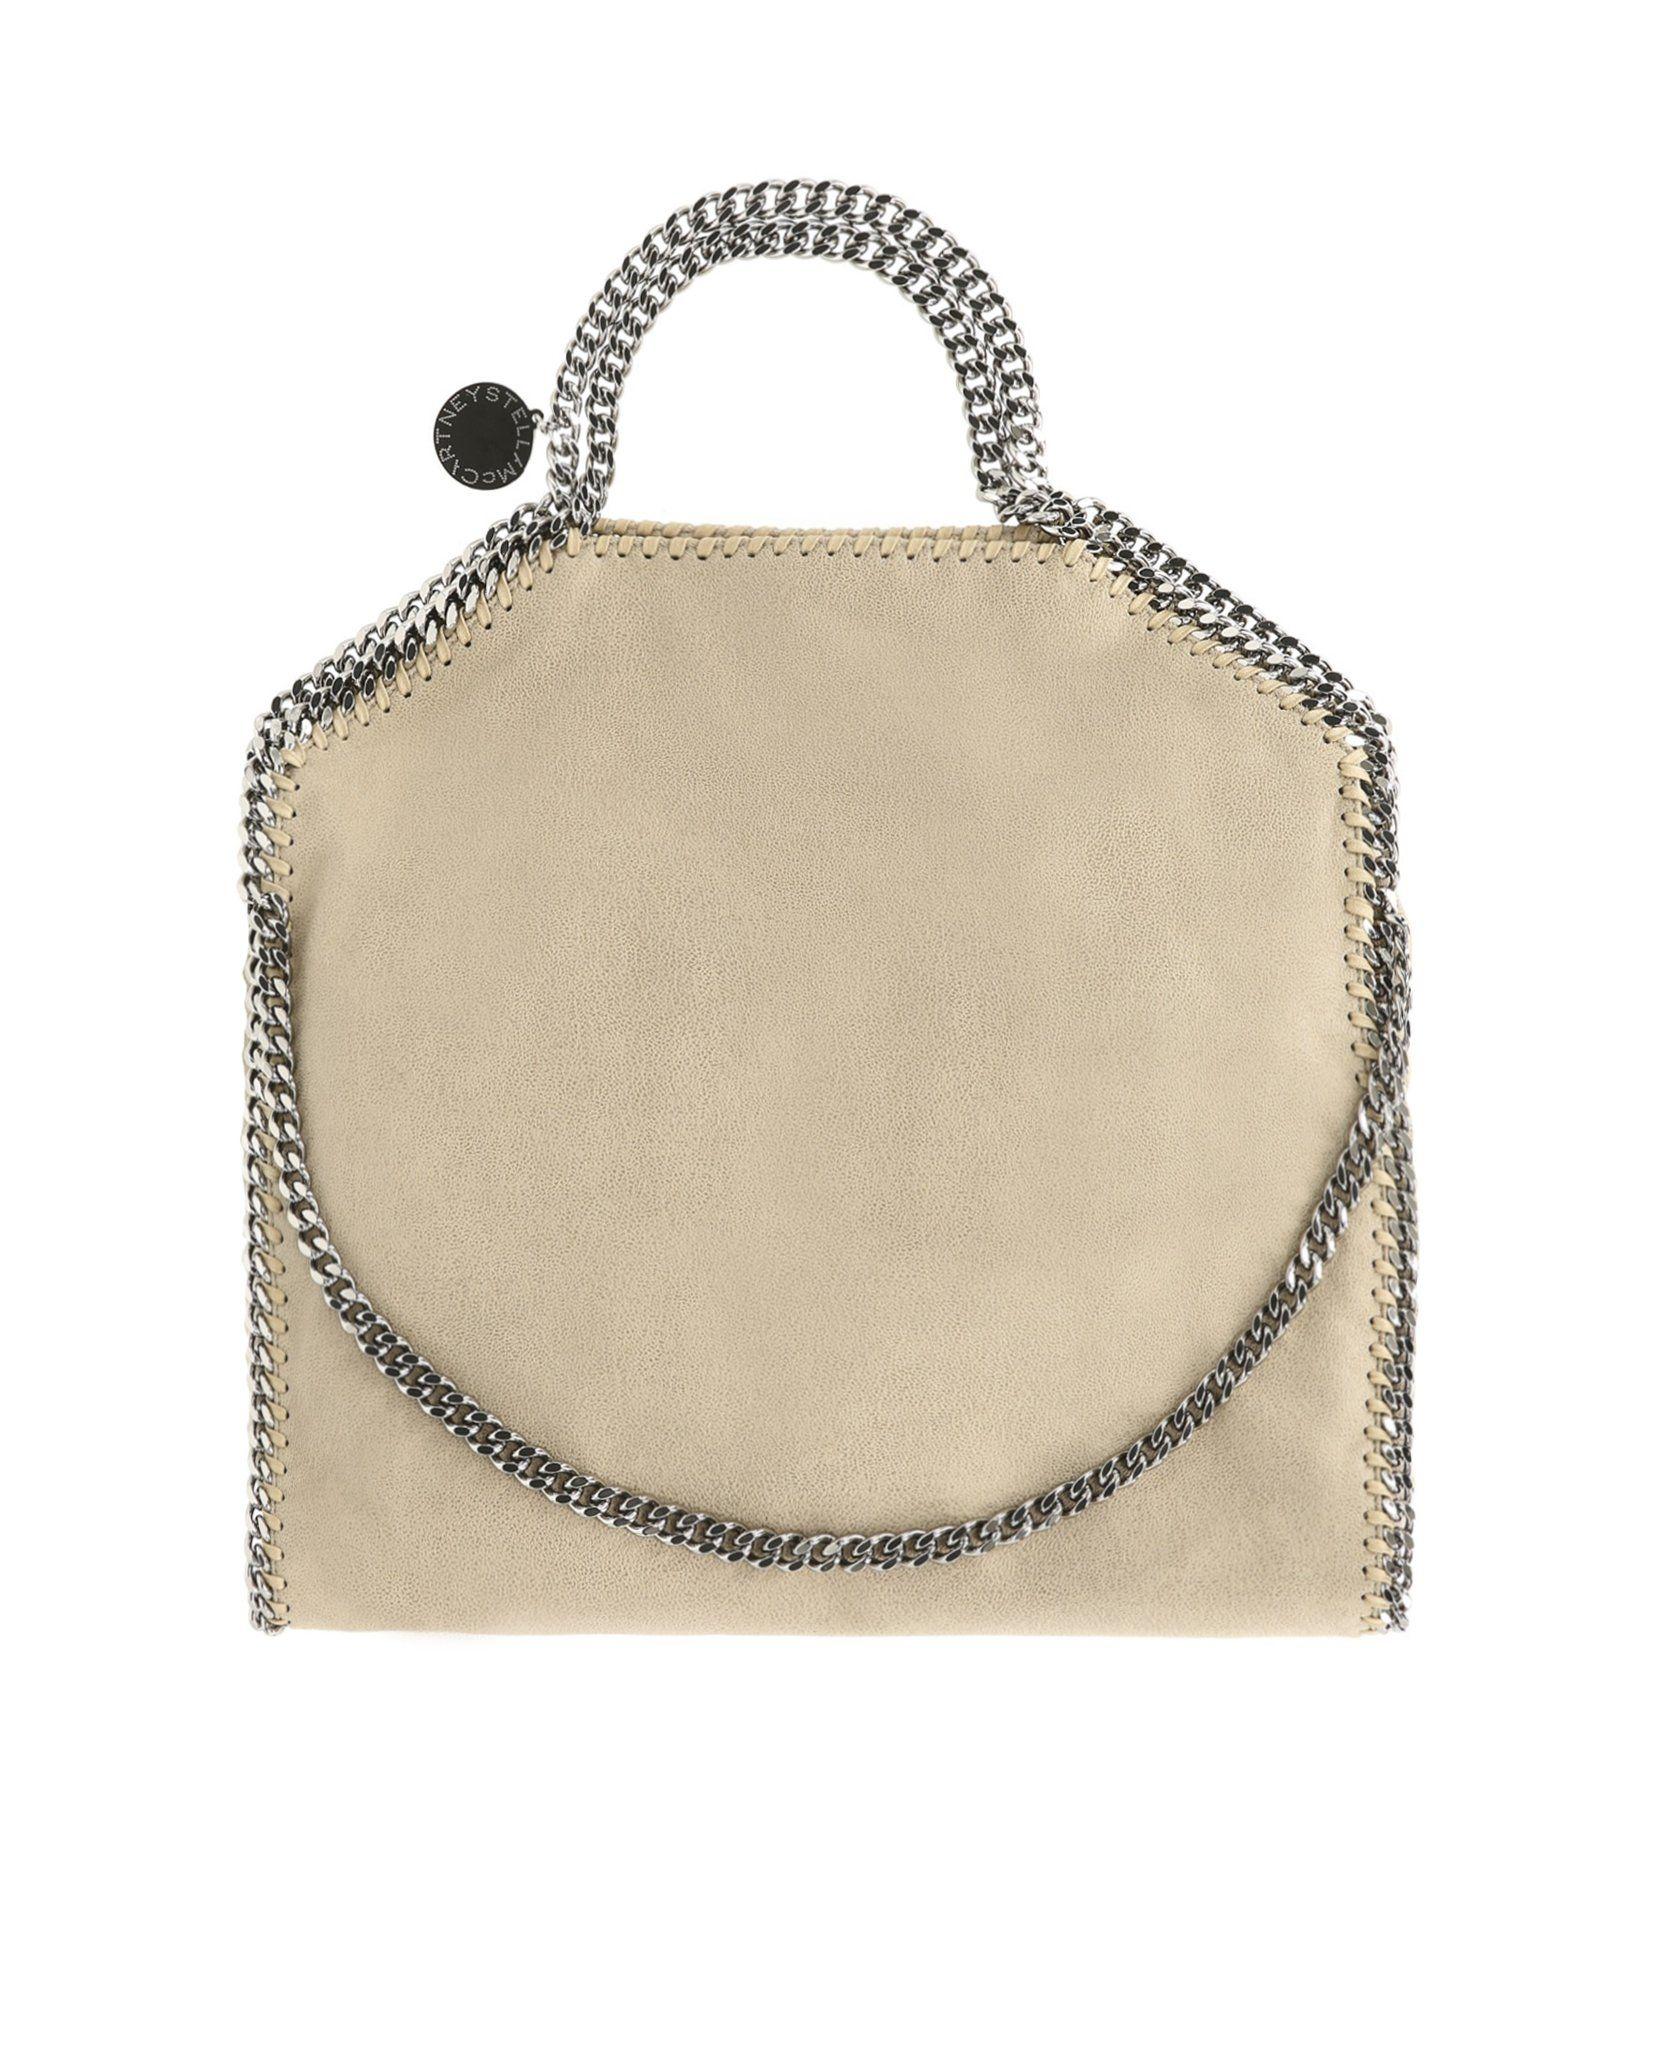 7361bd81b2 Stella McCartney Falabella Fold-Over Tote Bag